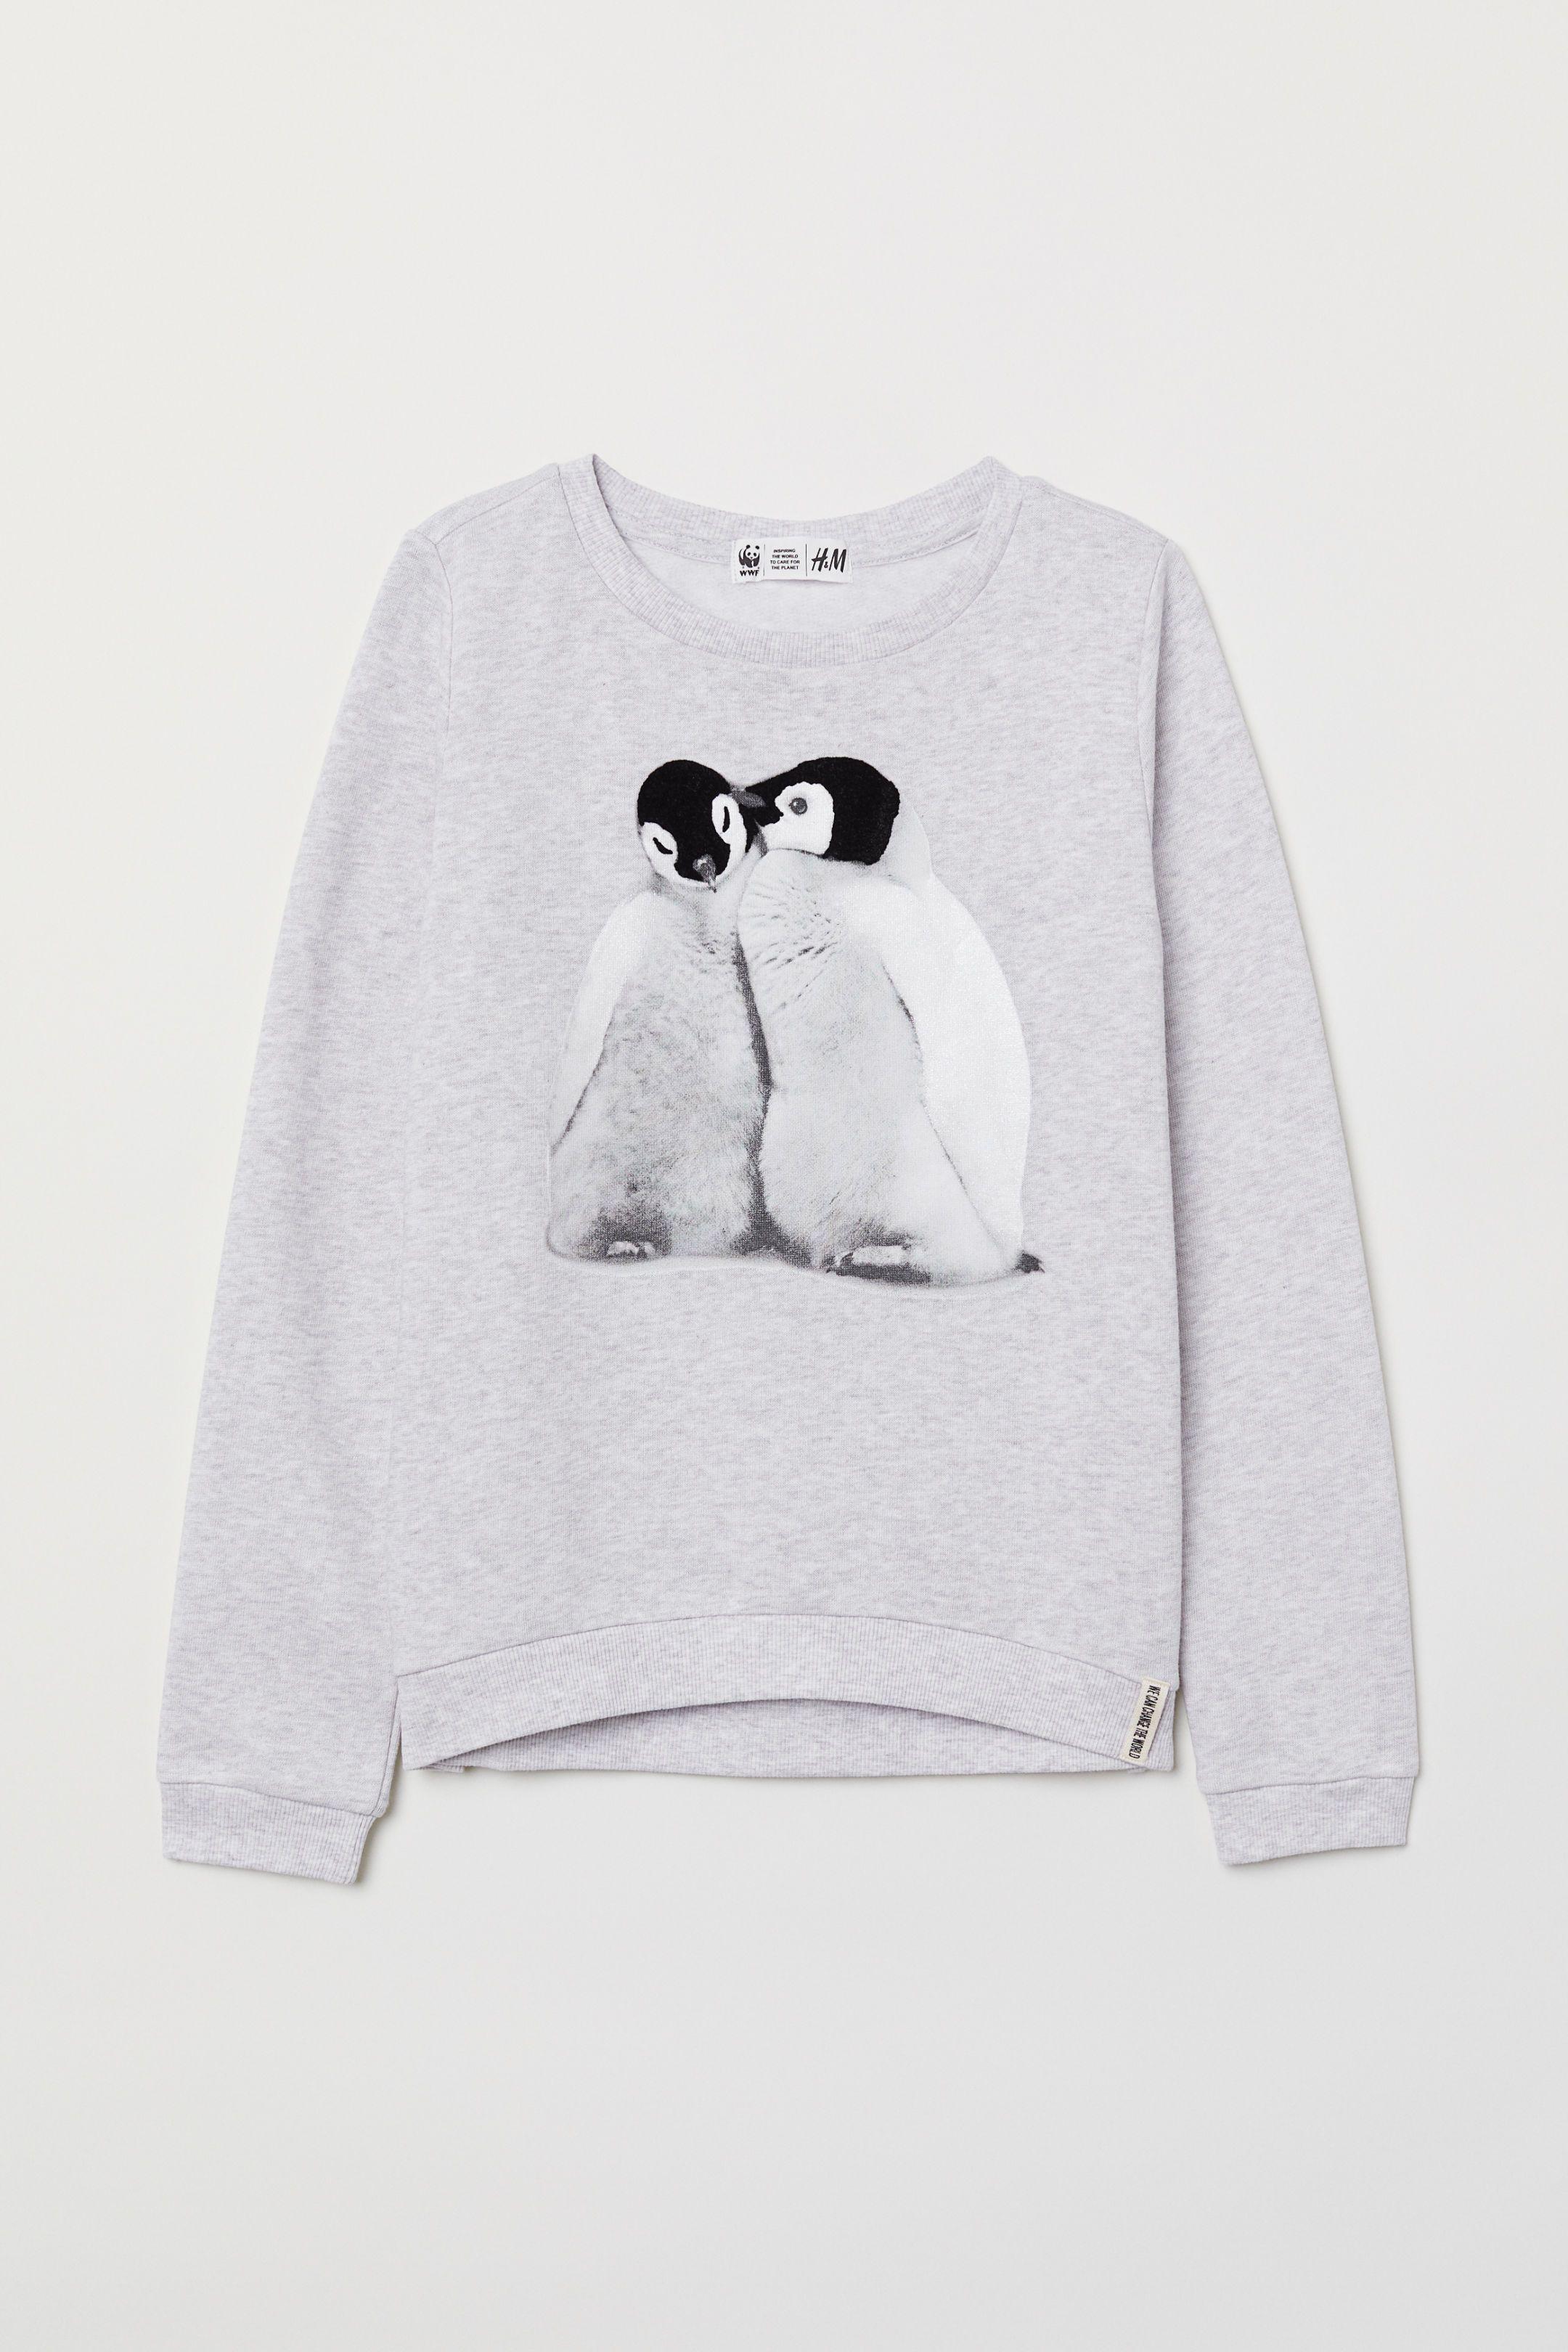 334e282a45b9 Sweatshirt with Printed Design | APPAREL-GIRL | Printed sweatshirts ...